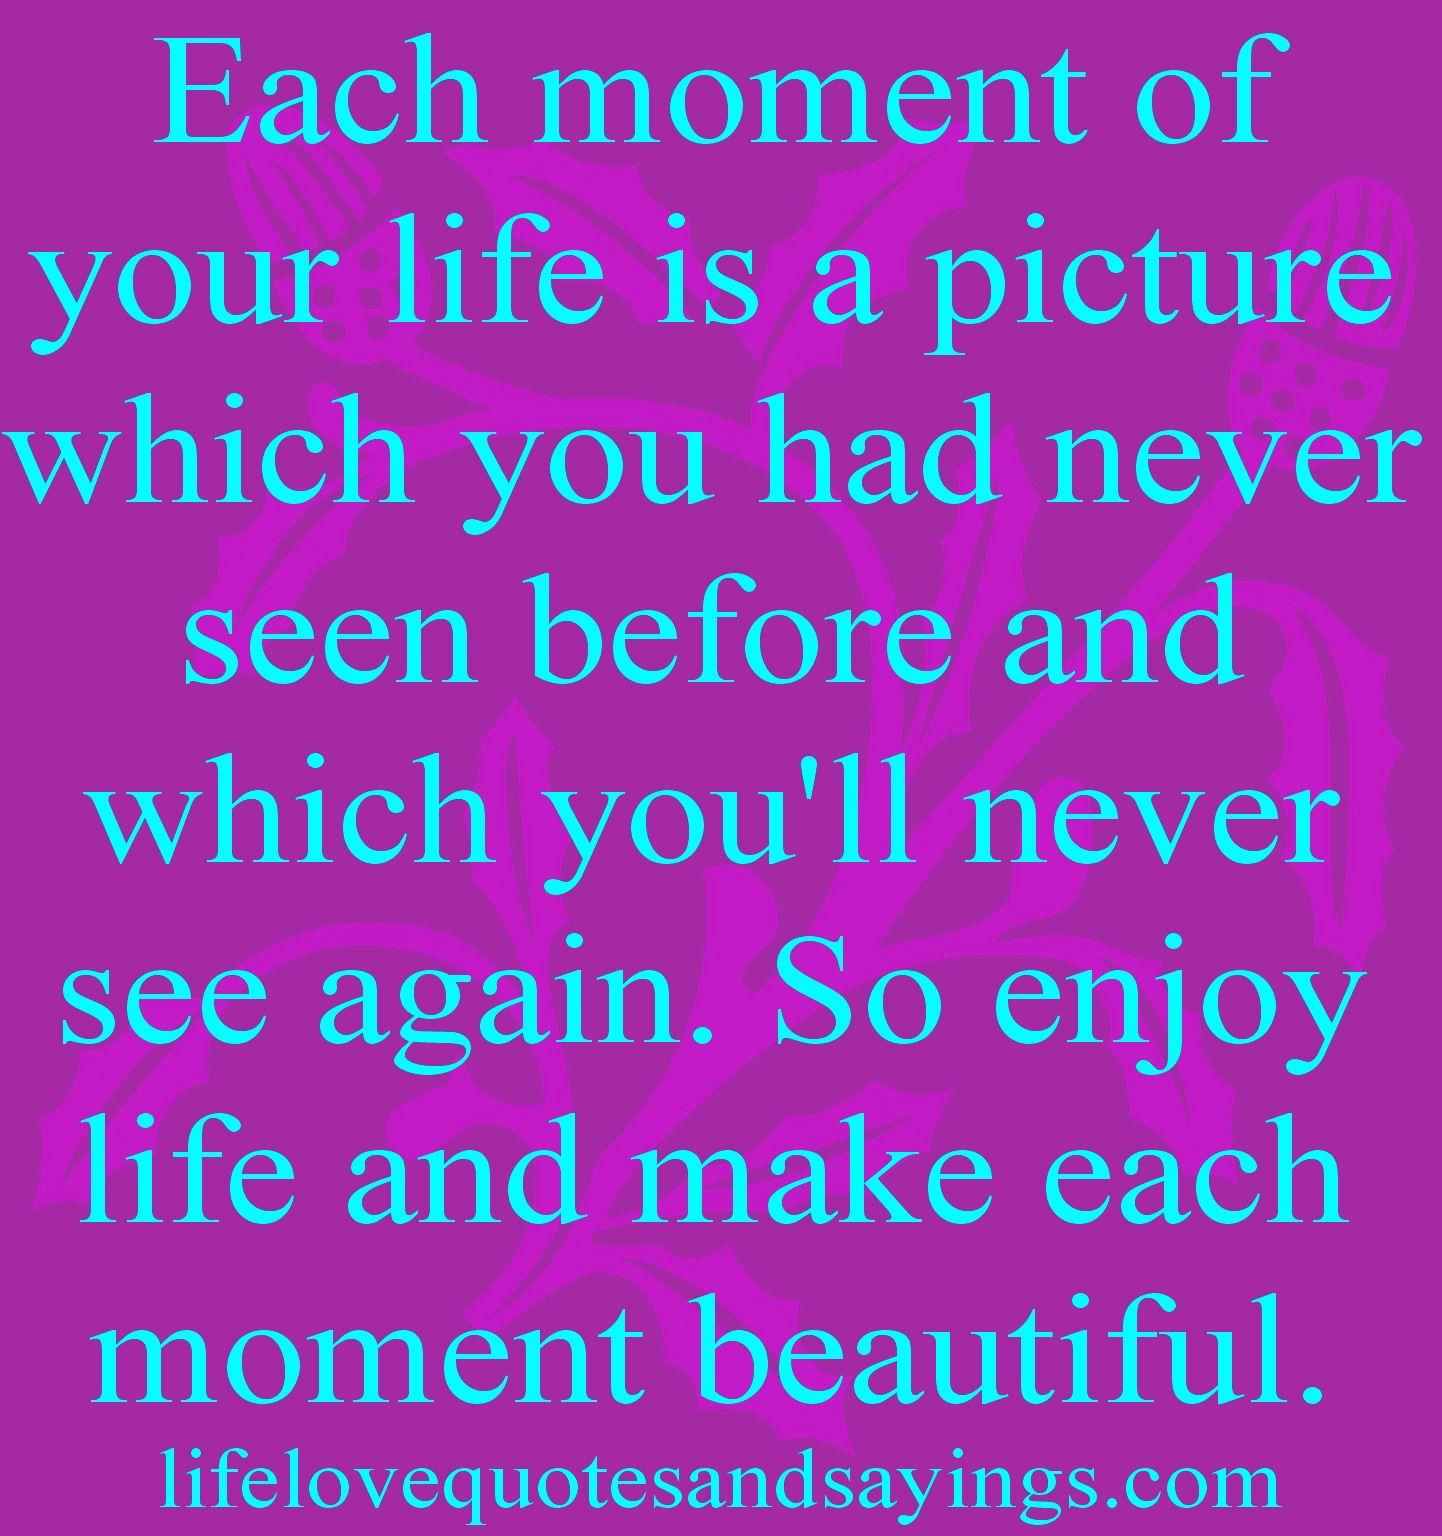 Enjoy Each Moment Quot...